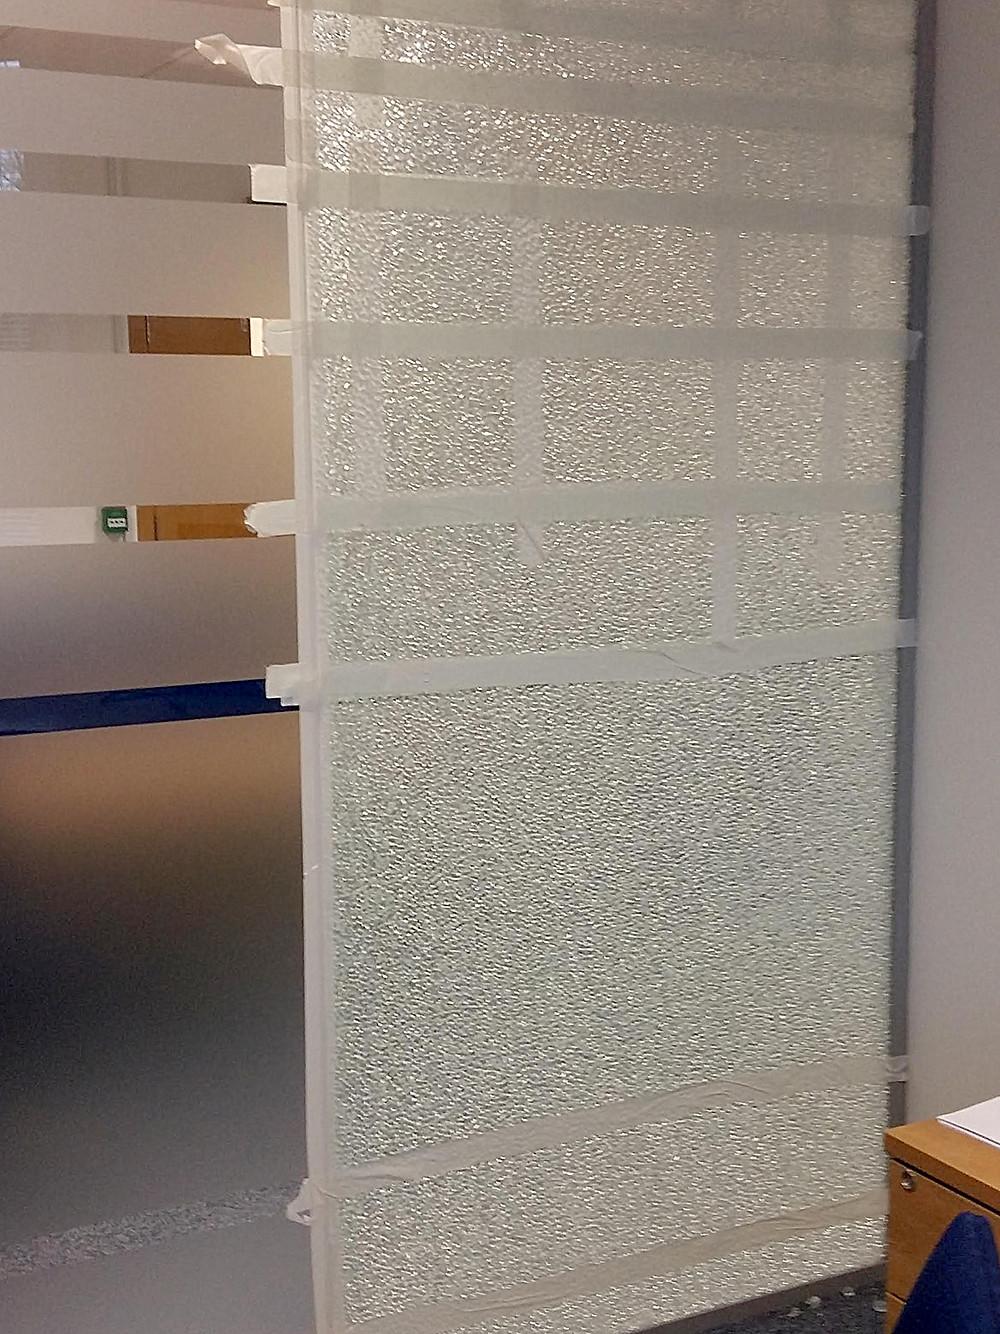 Example of Spontaneous Glass Panel Breakage